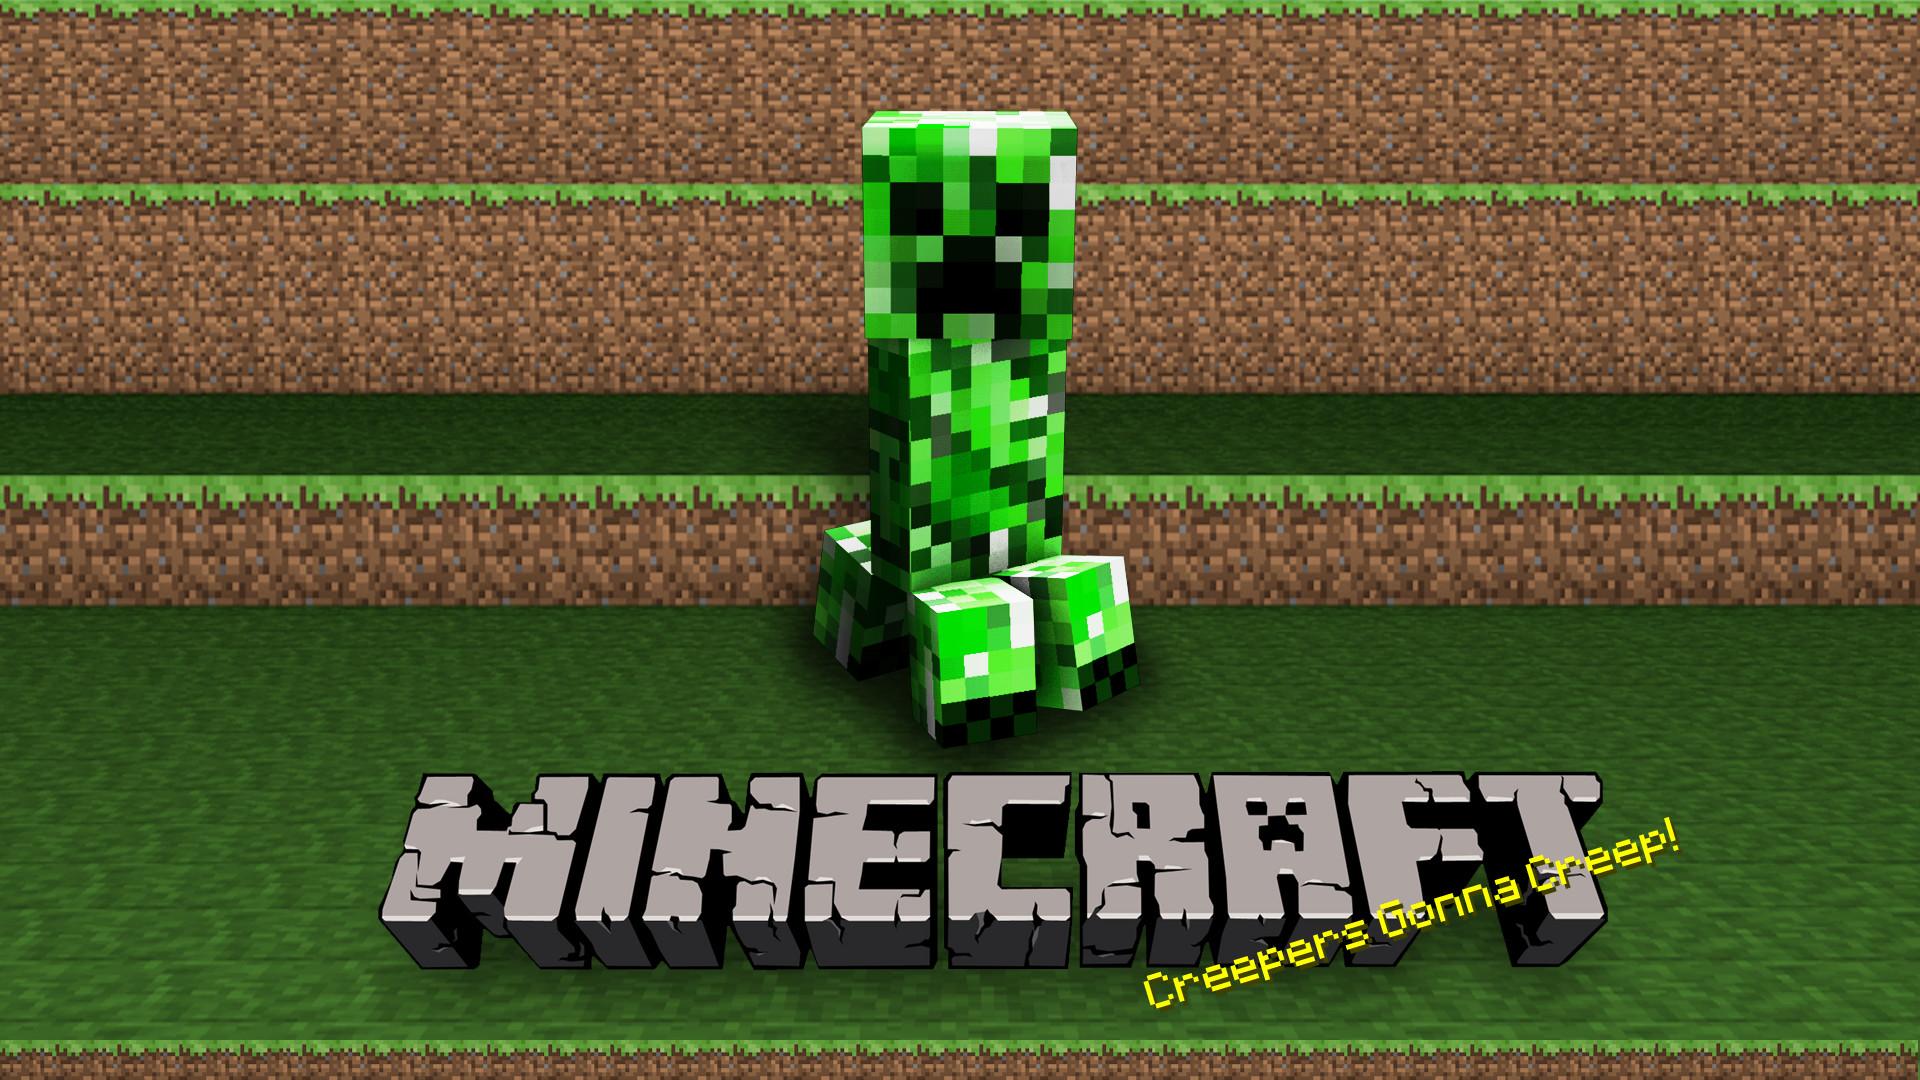 Good Wallpaper Minecraft Kawaii - 602195-minecraft-creeper-backgrounds-1920x1080-for-4k  Pic_31786.jpg